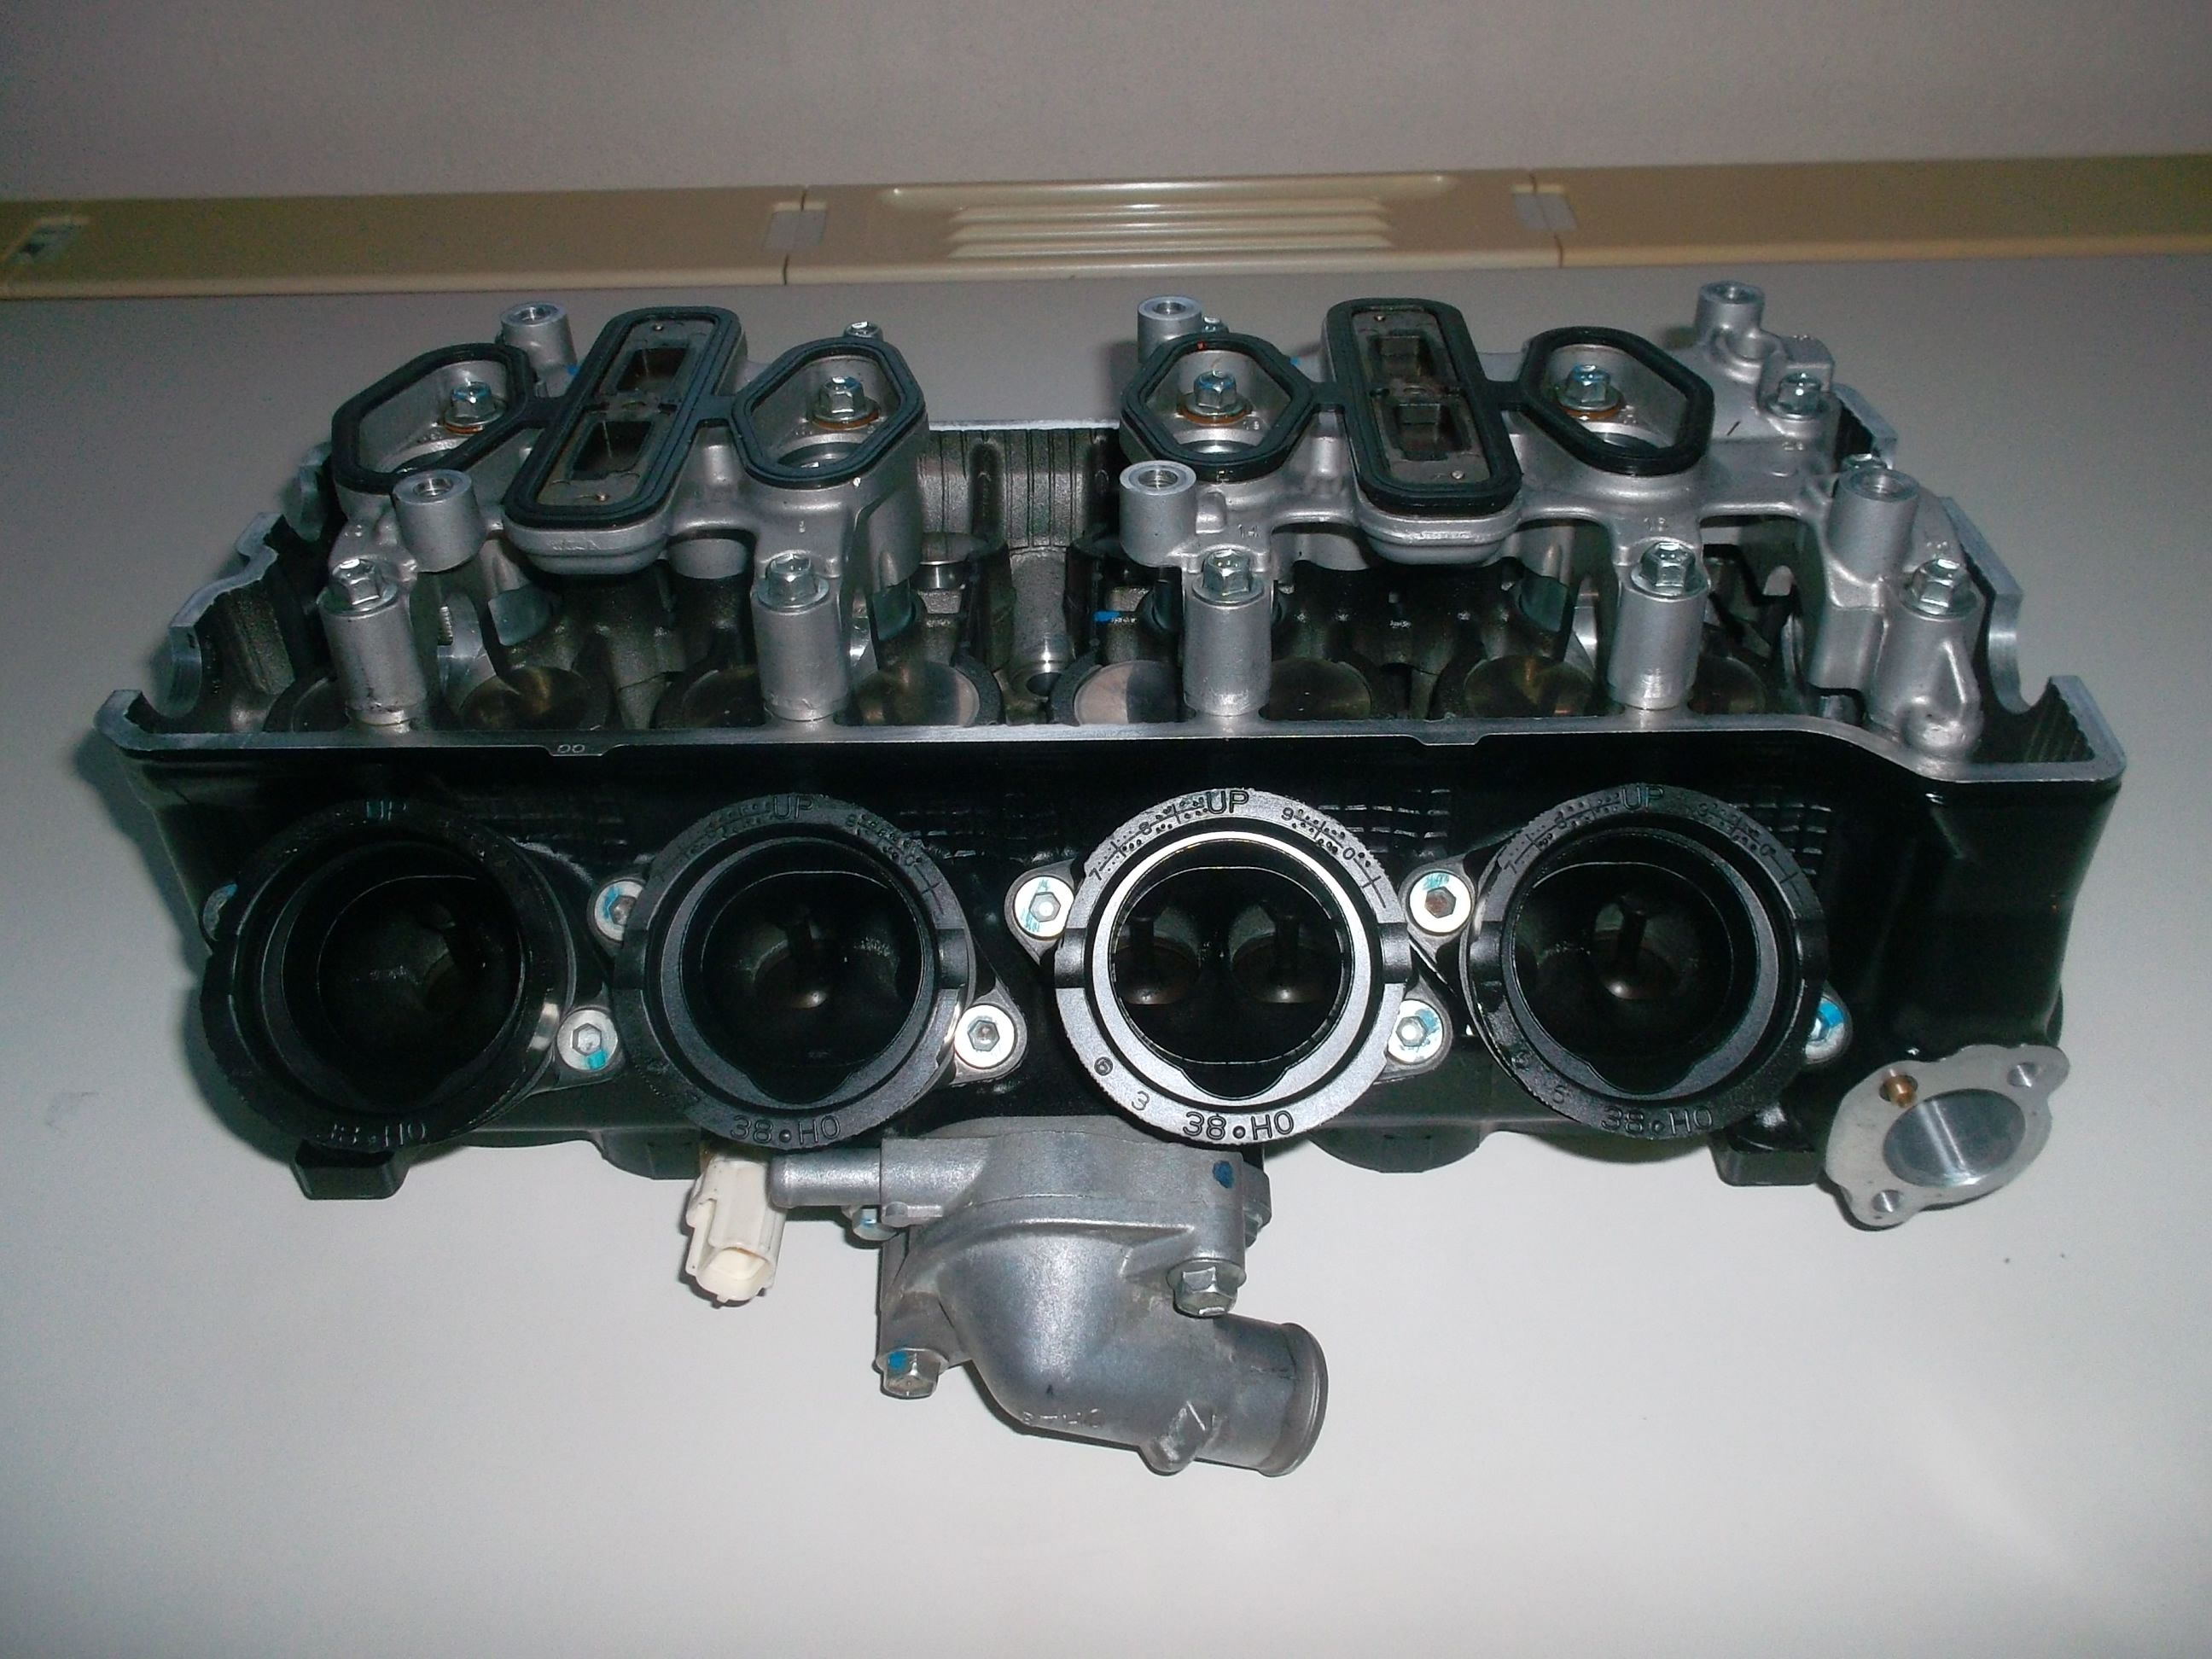 Zylinderkopf GSXR 750 L1 Image